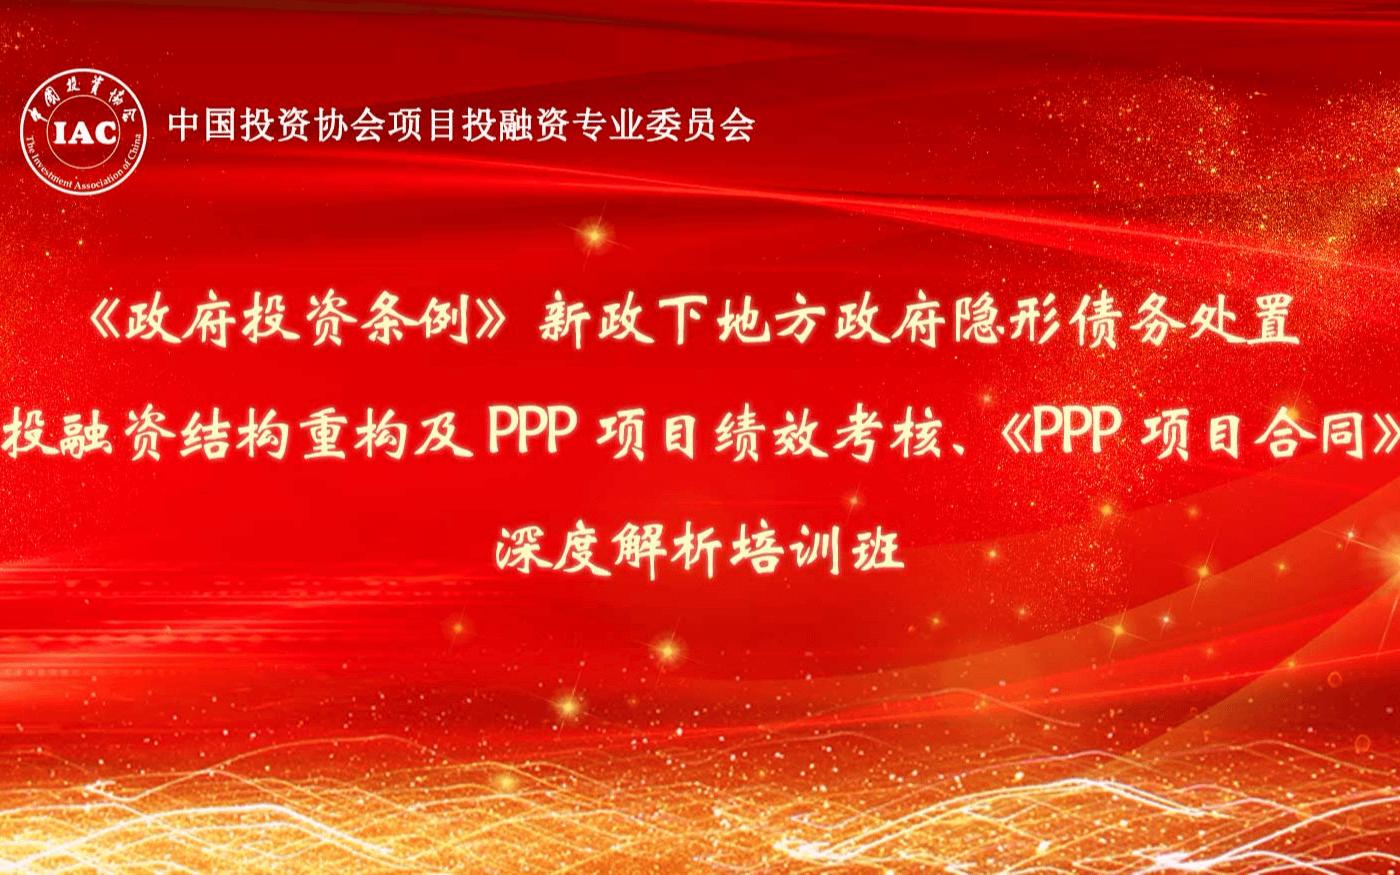 2019 PPP项目绩效考核、《PPP项目合同》深度解析培训班(11月南宁班)